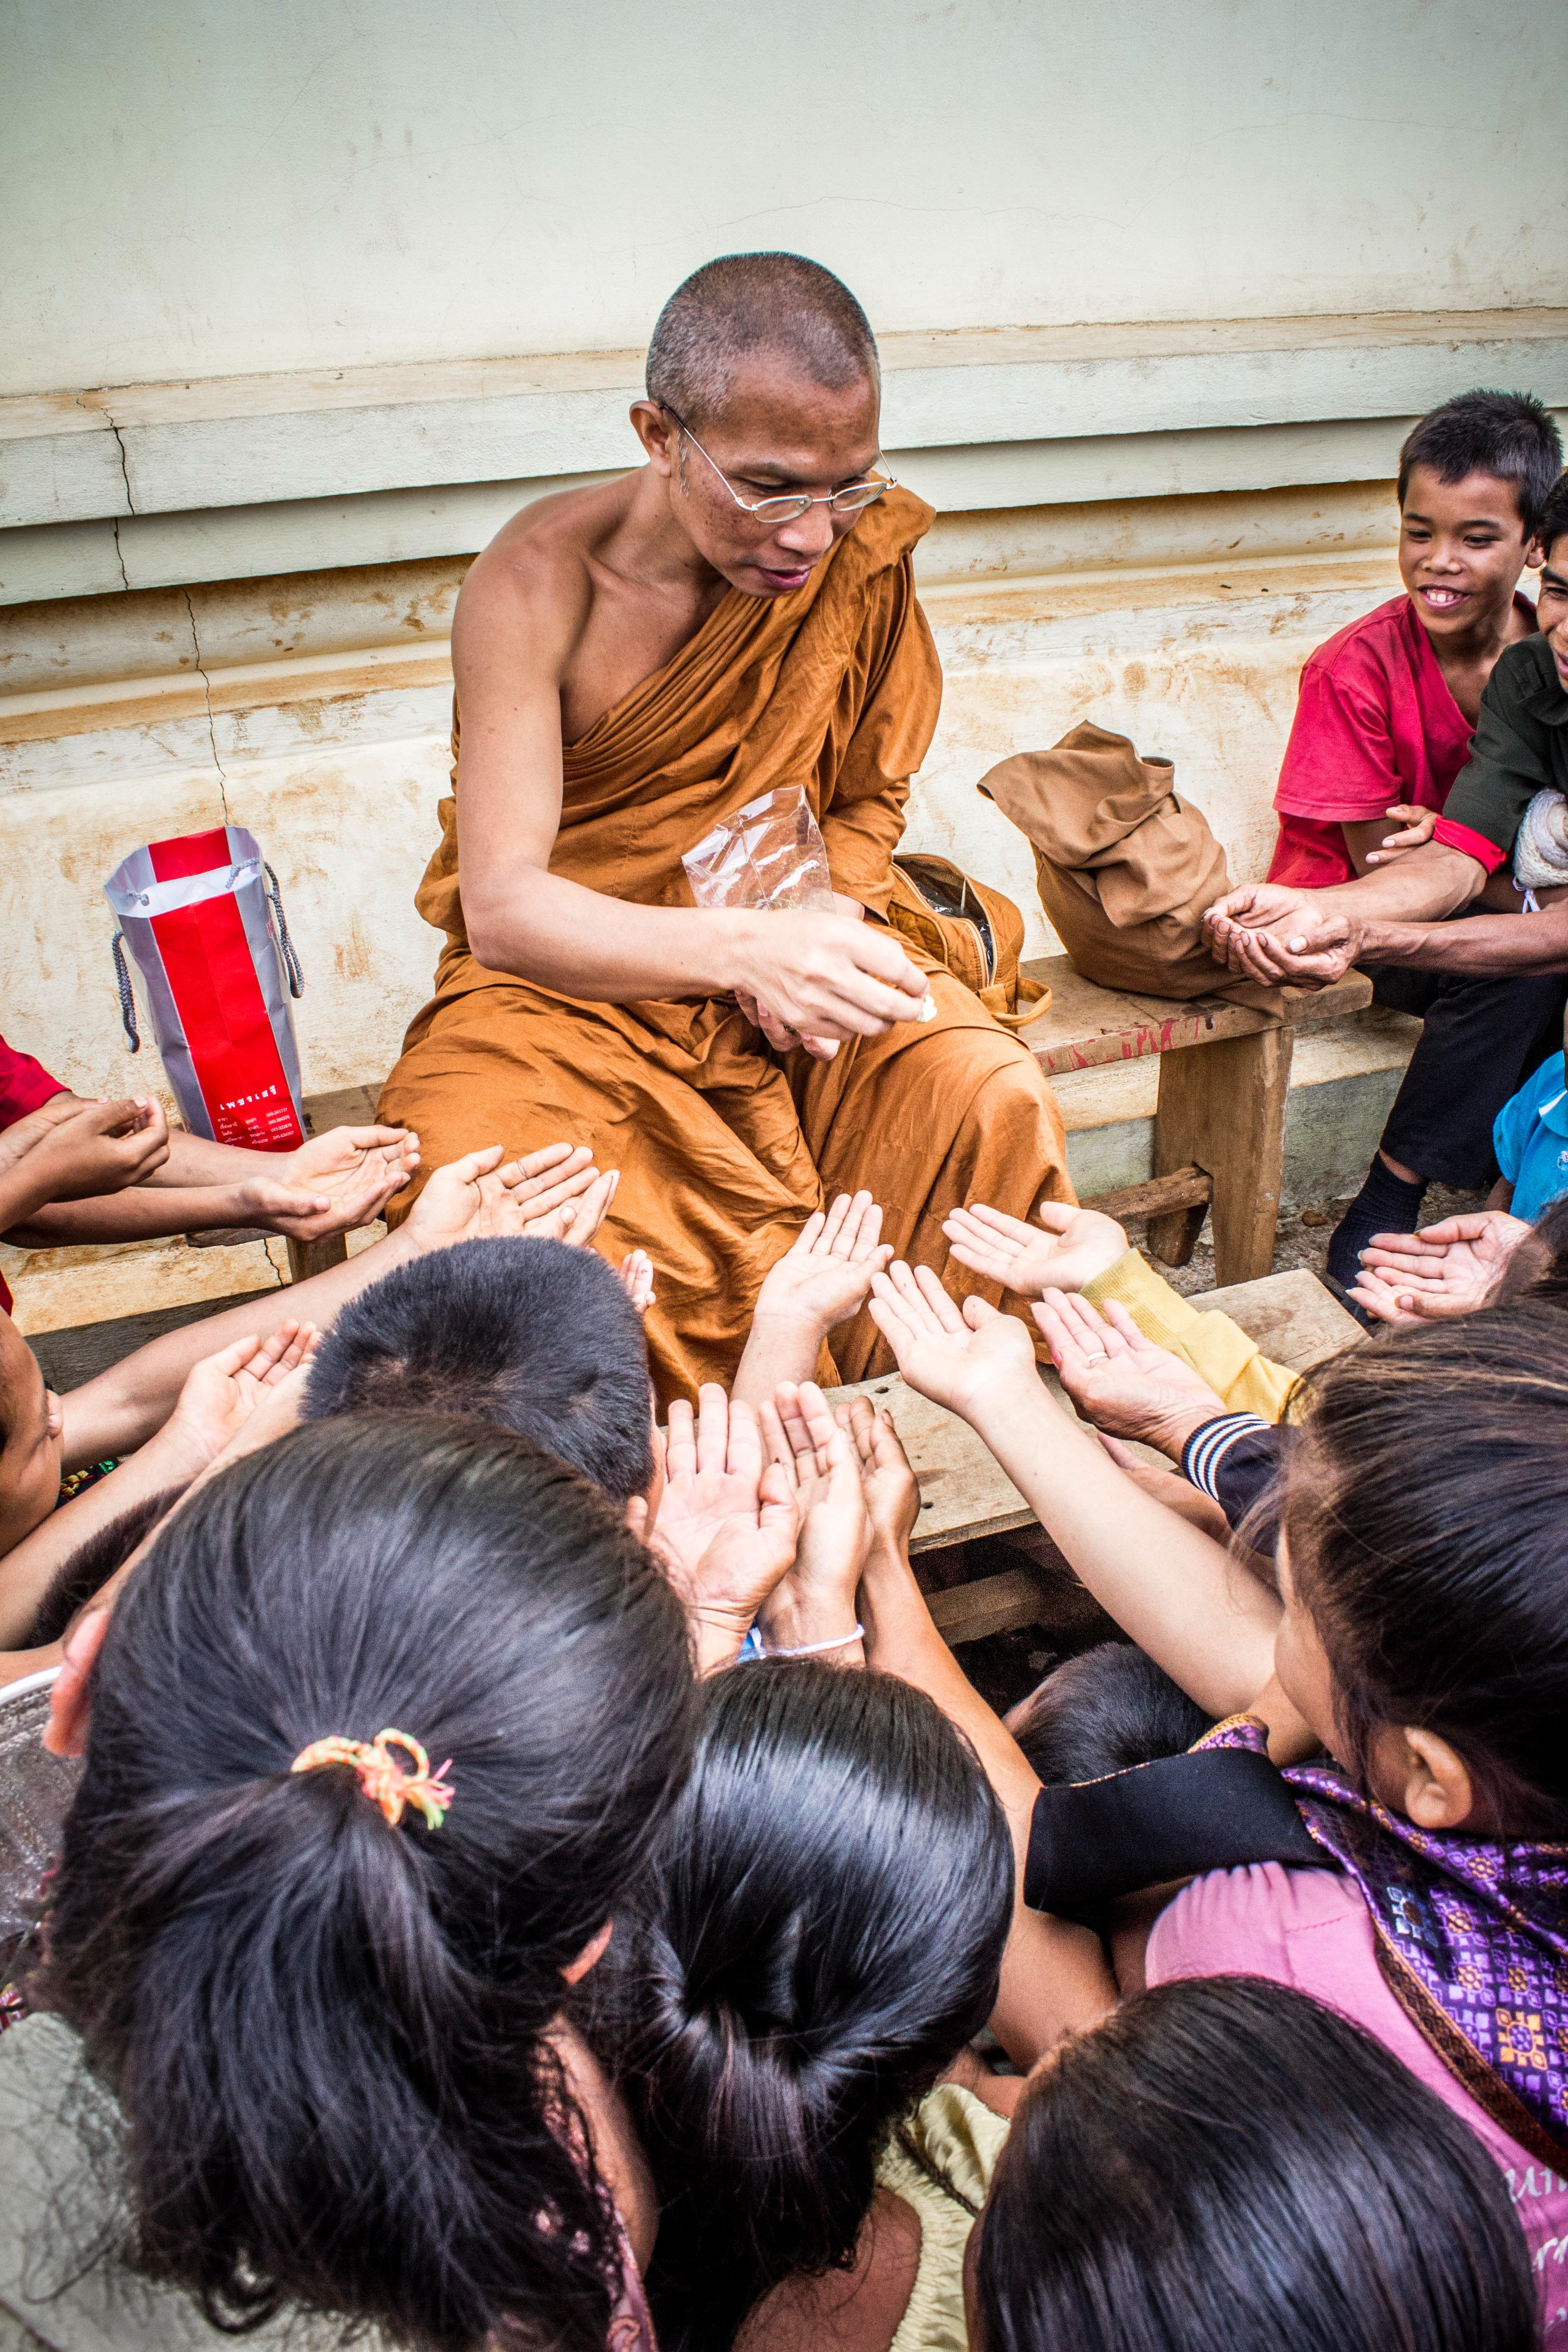 Monk Handing Towards Kids, Adult, Kids, Wooden bench, Wear, HQ Photo